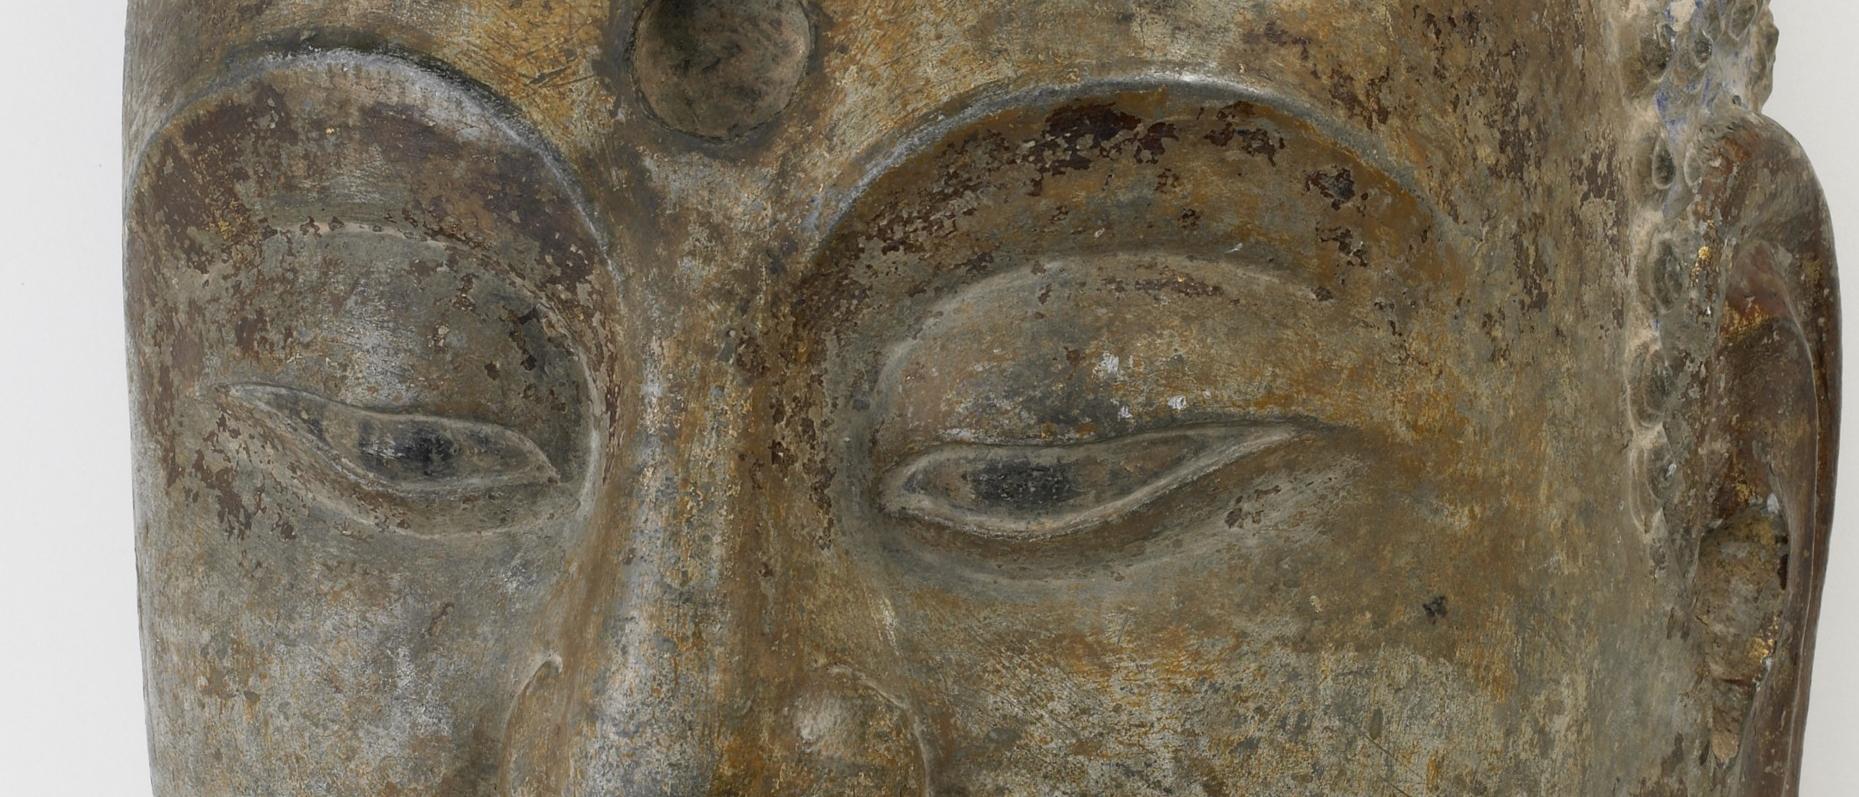 Eyes of a stone-carved buddha